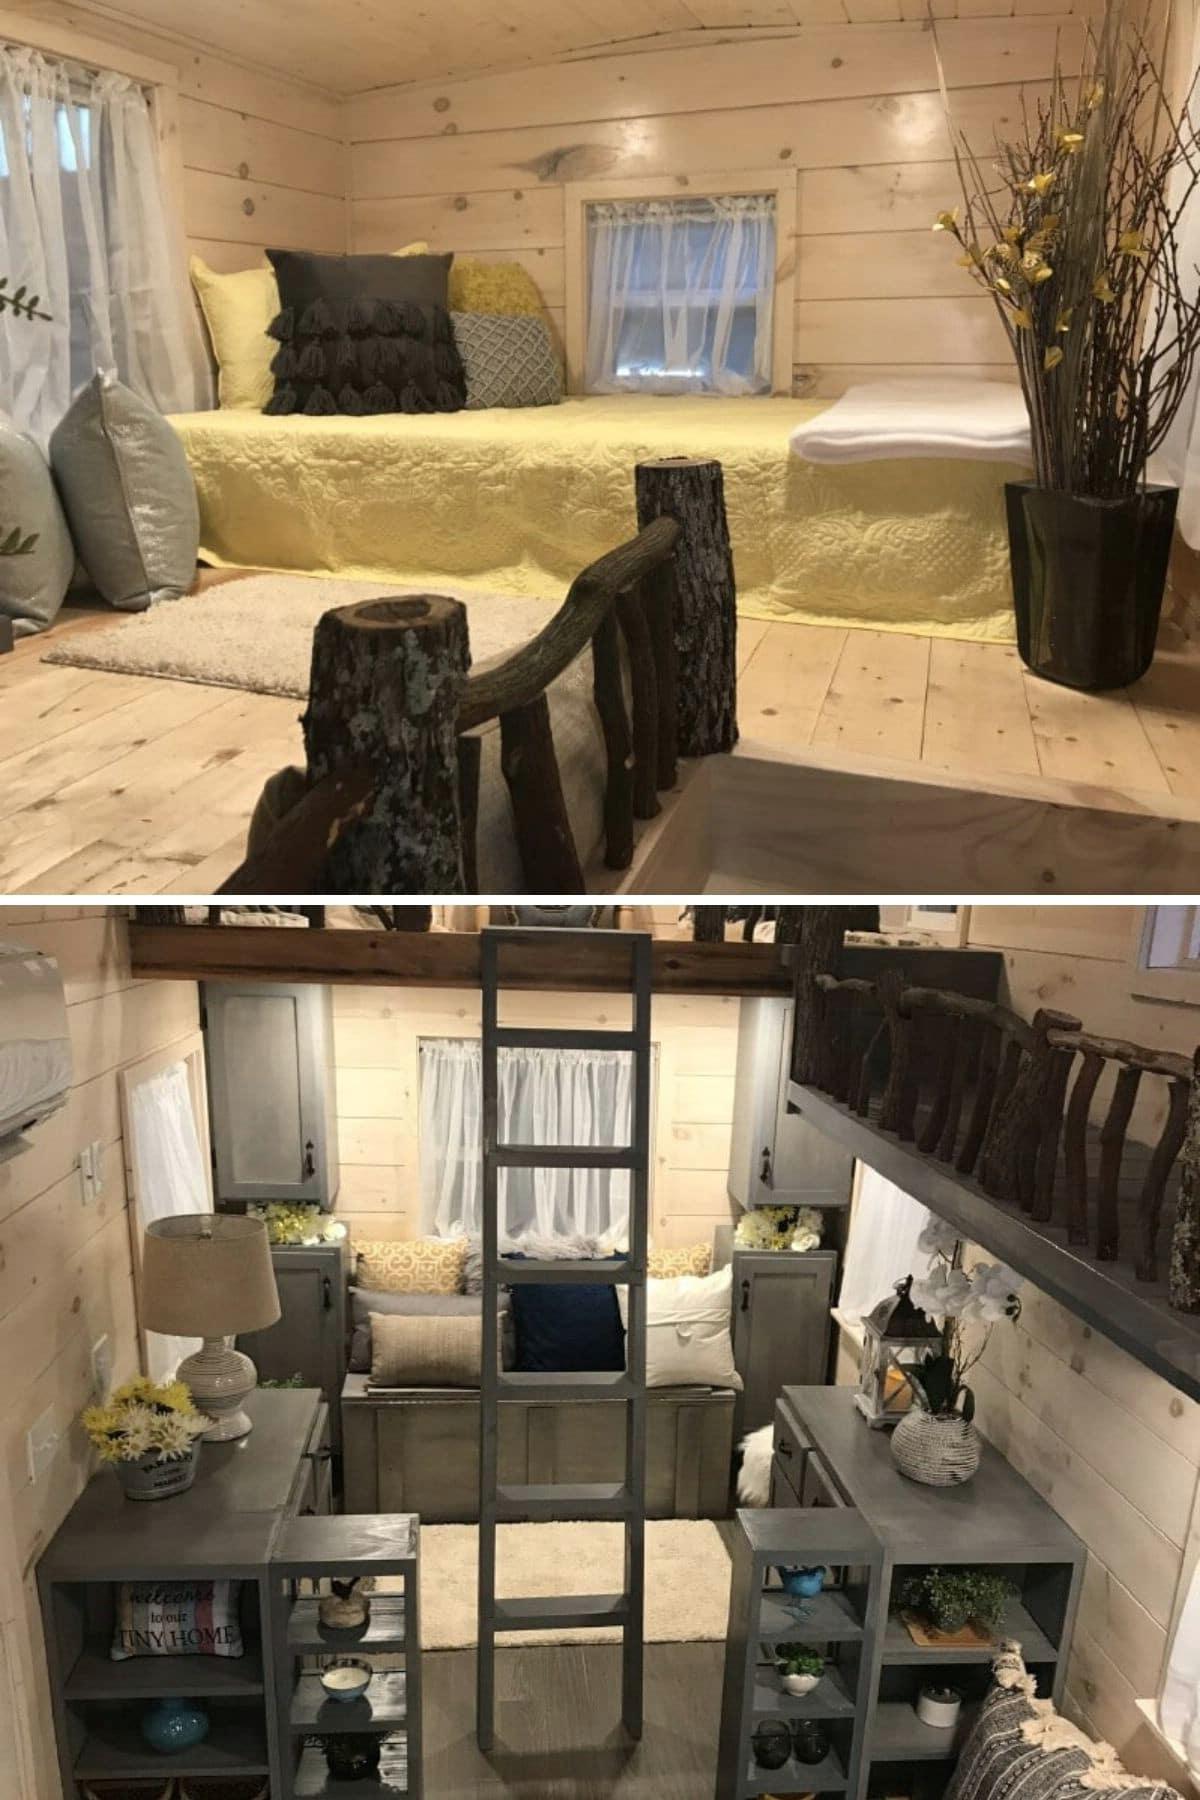 The Dandelion Tiny House